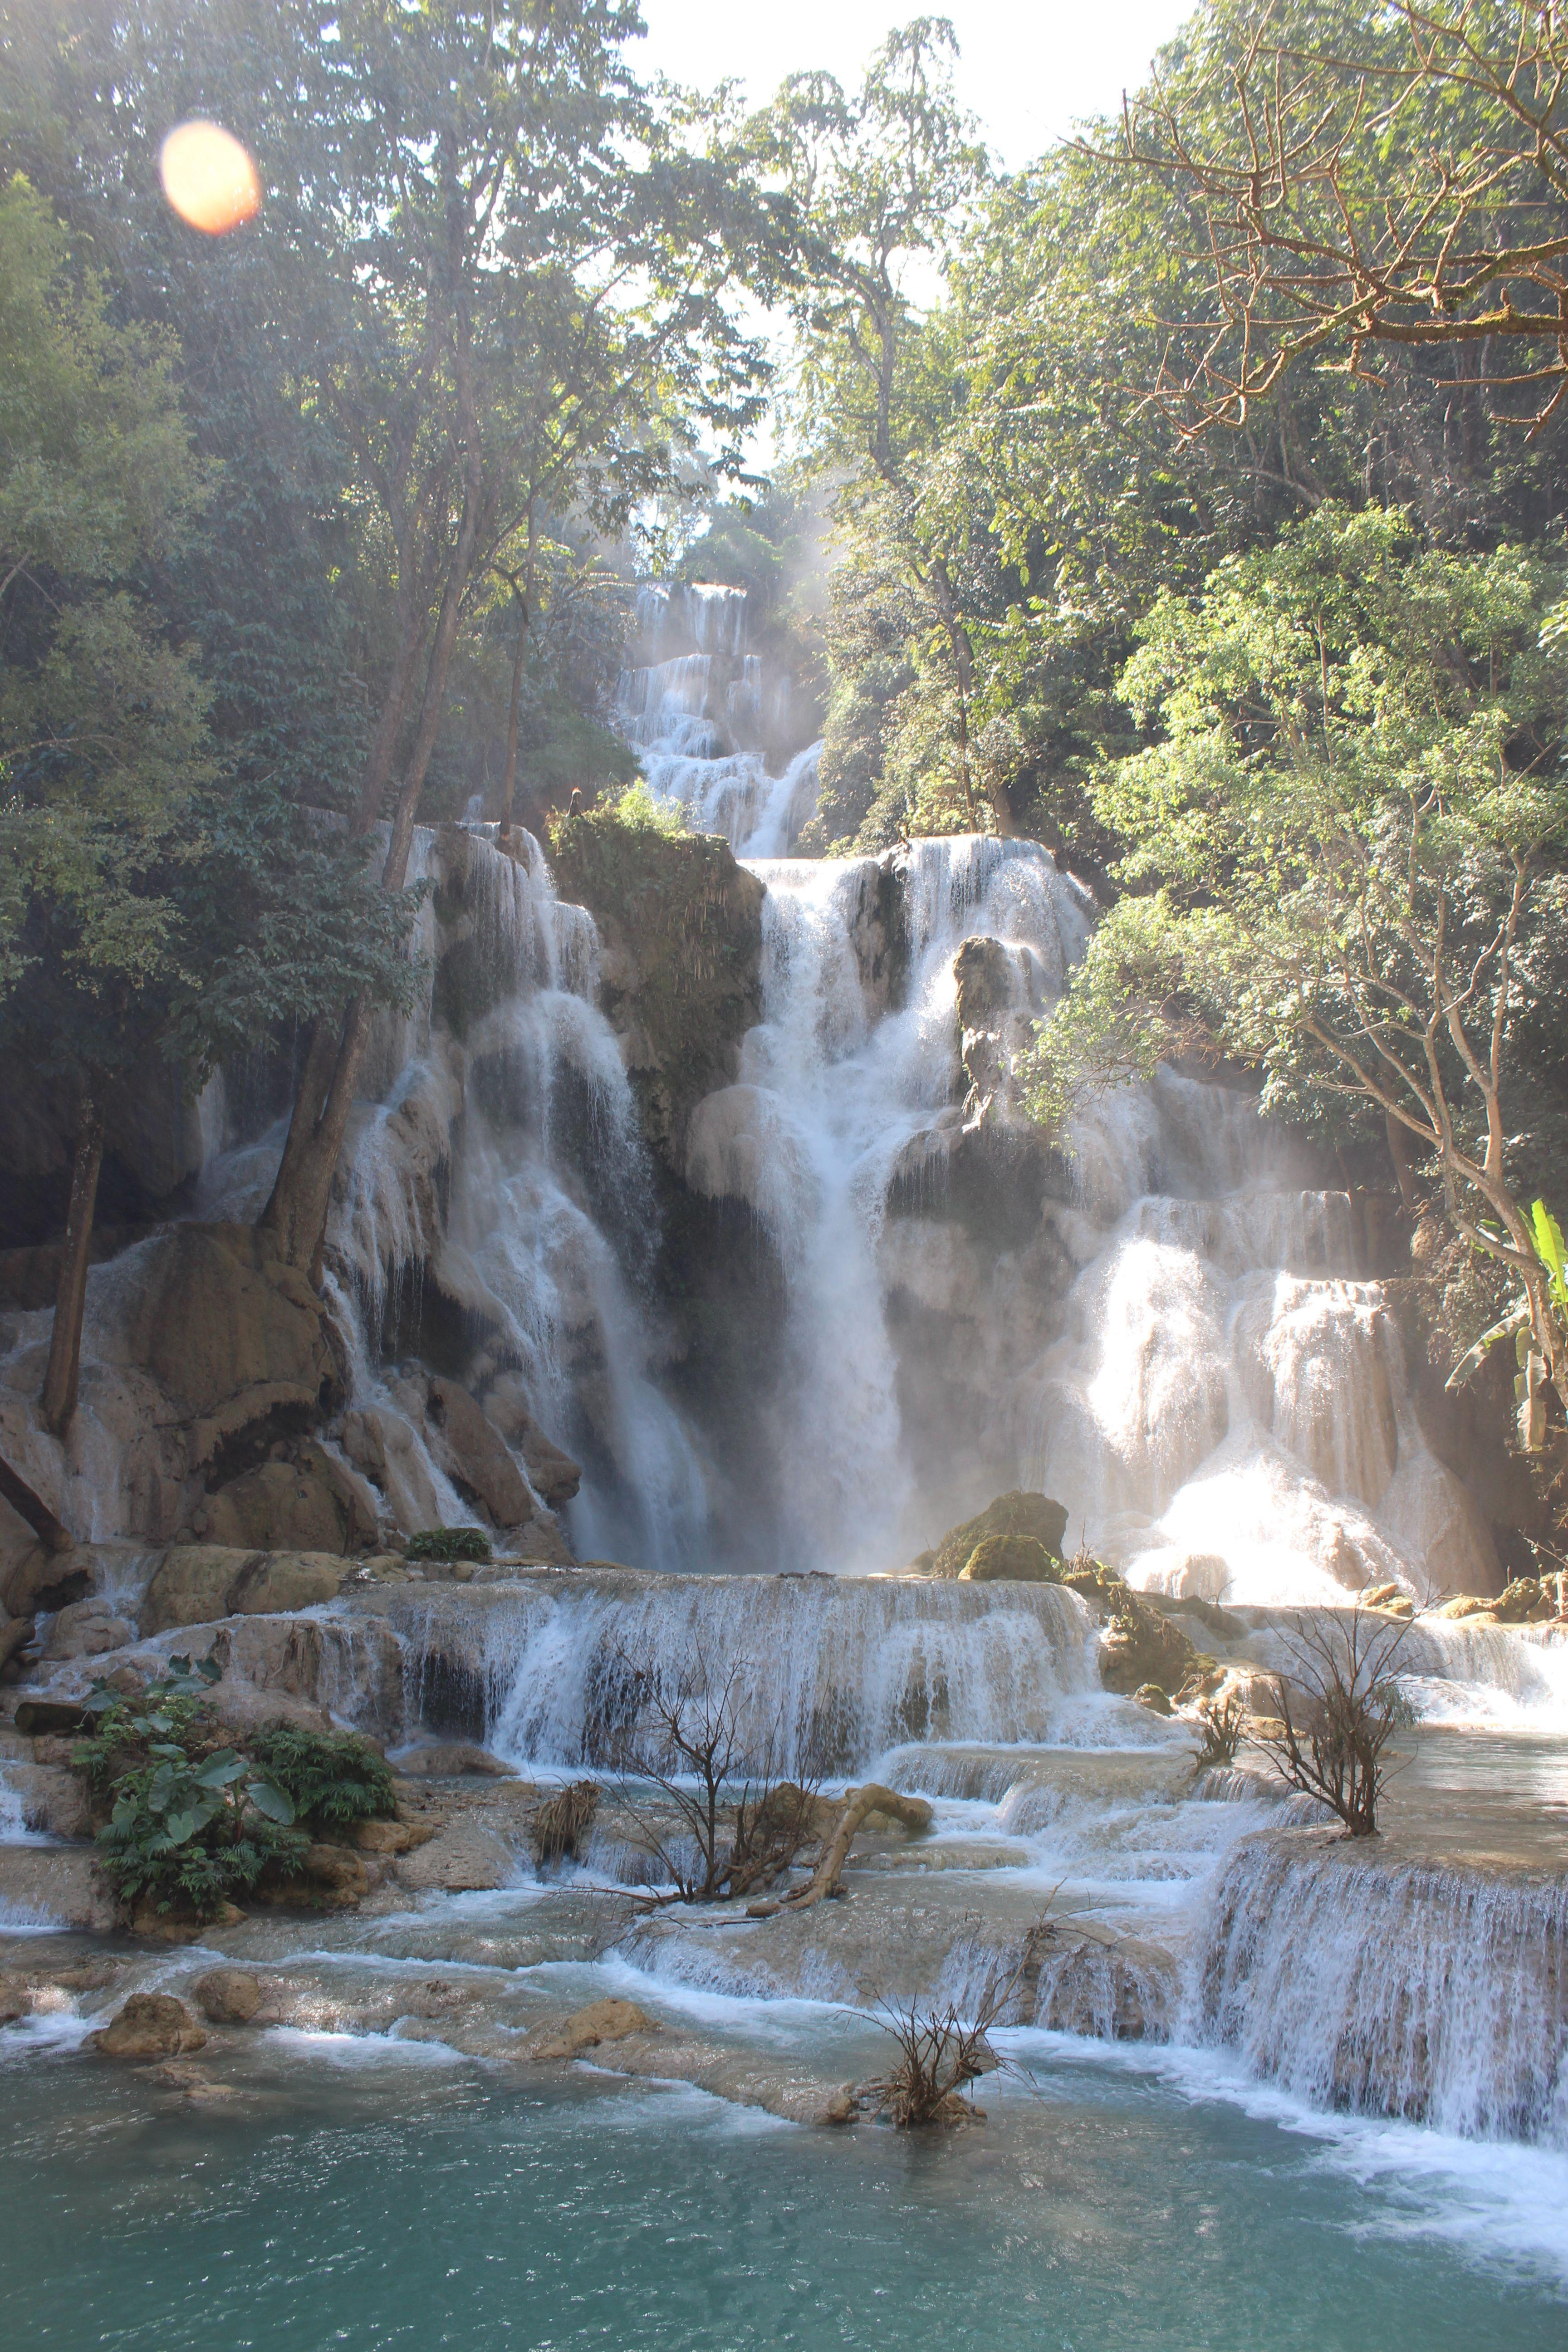 Tat Kuang Si Falls Luang Prabang Laos The Tat Kuang Si Falls